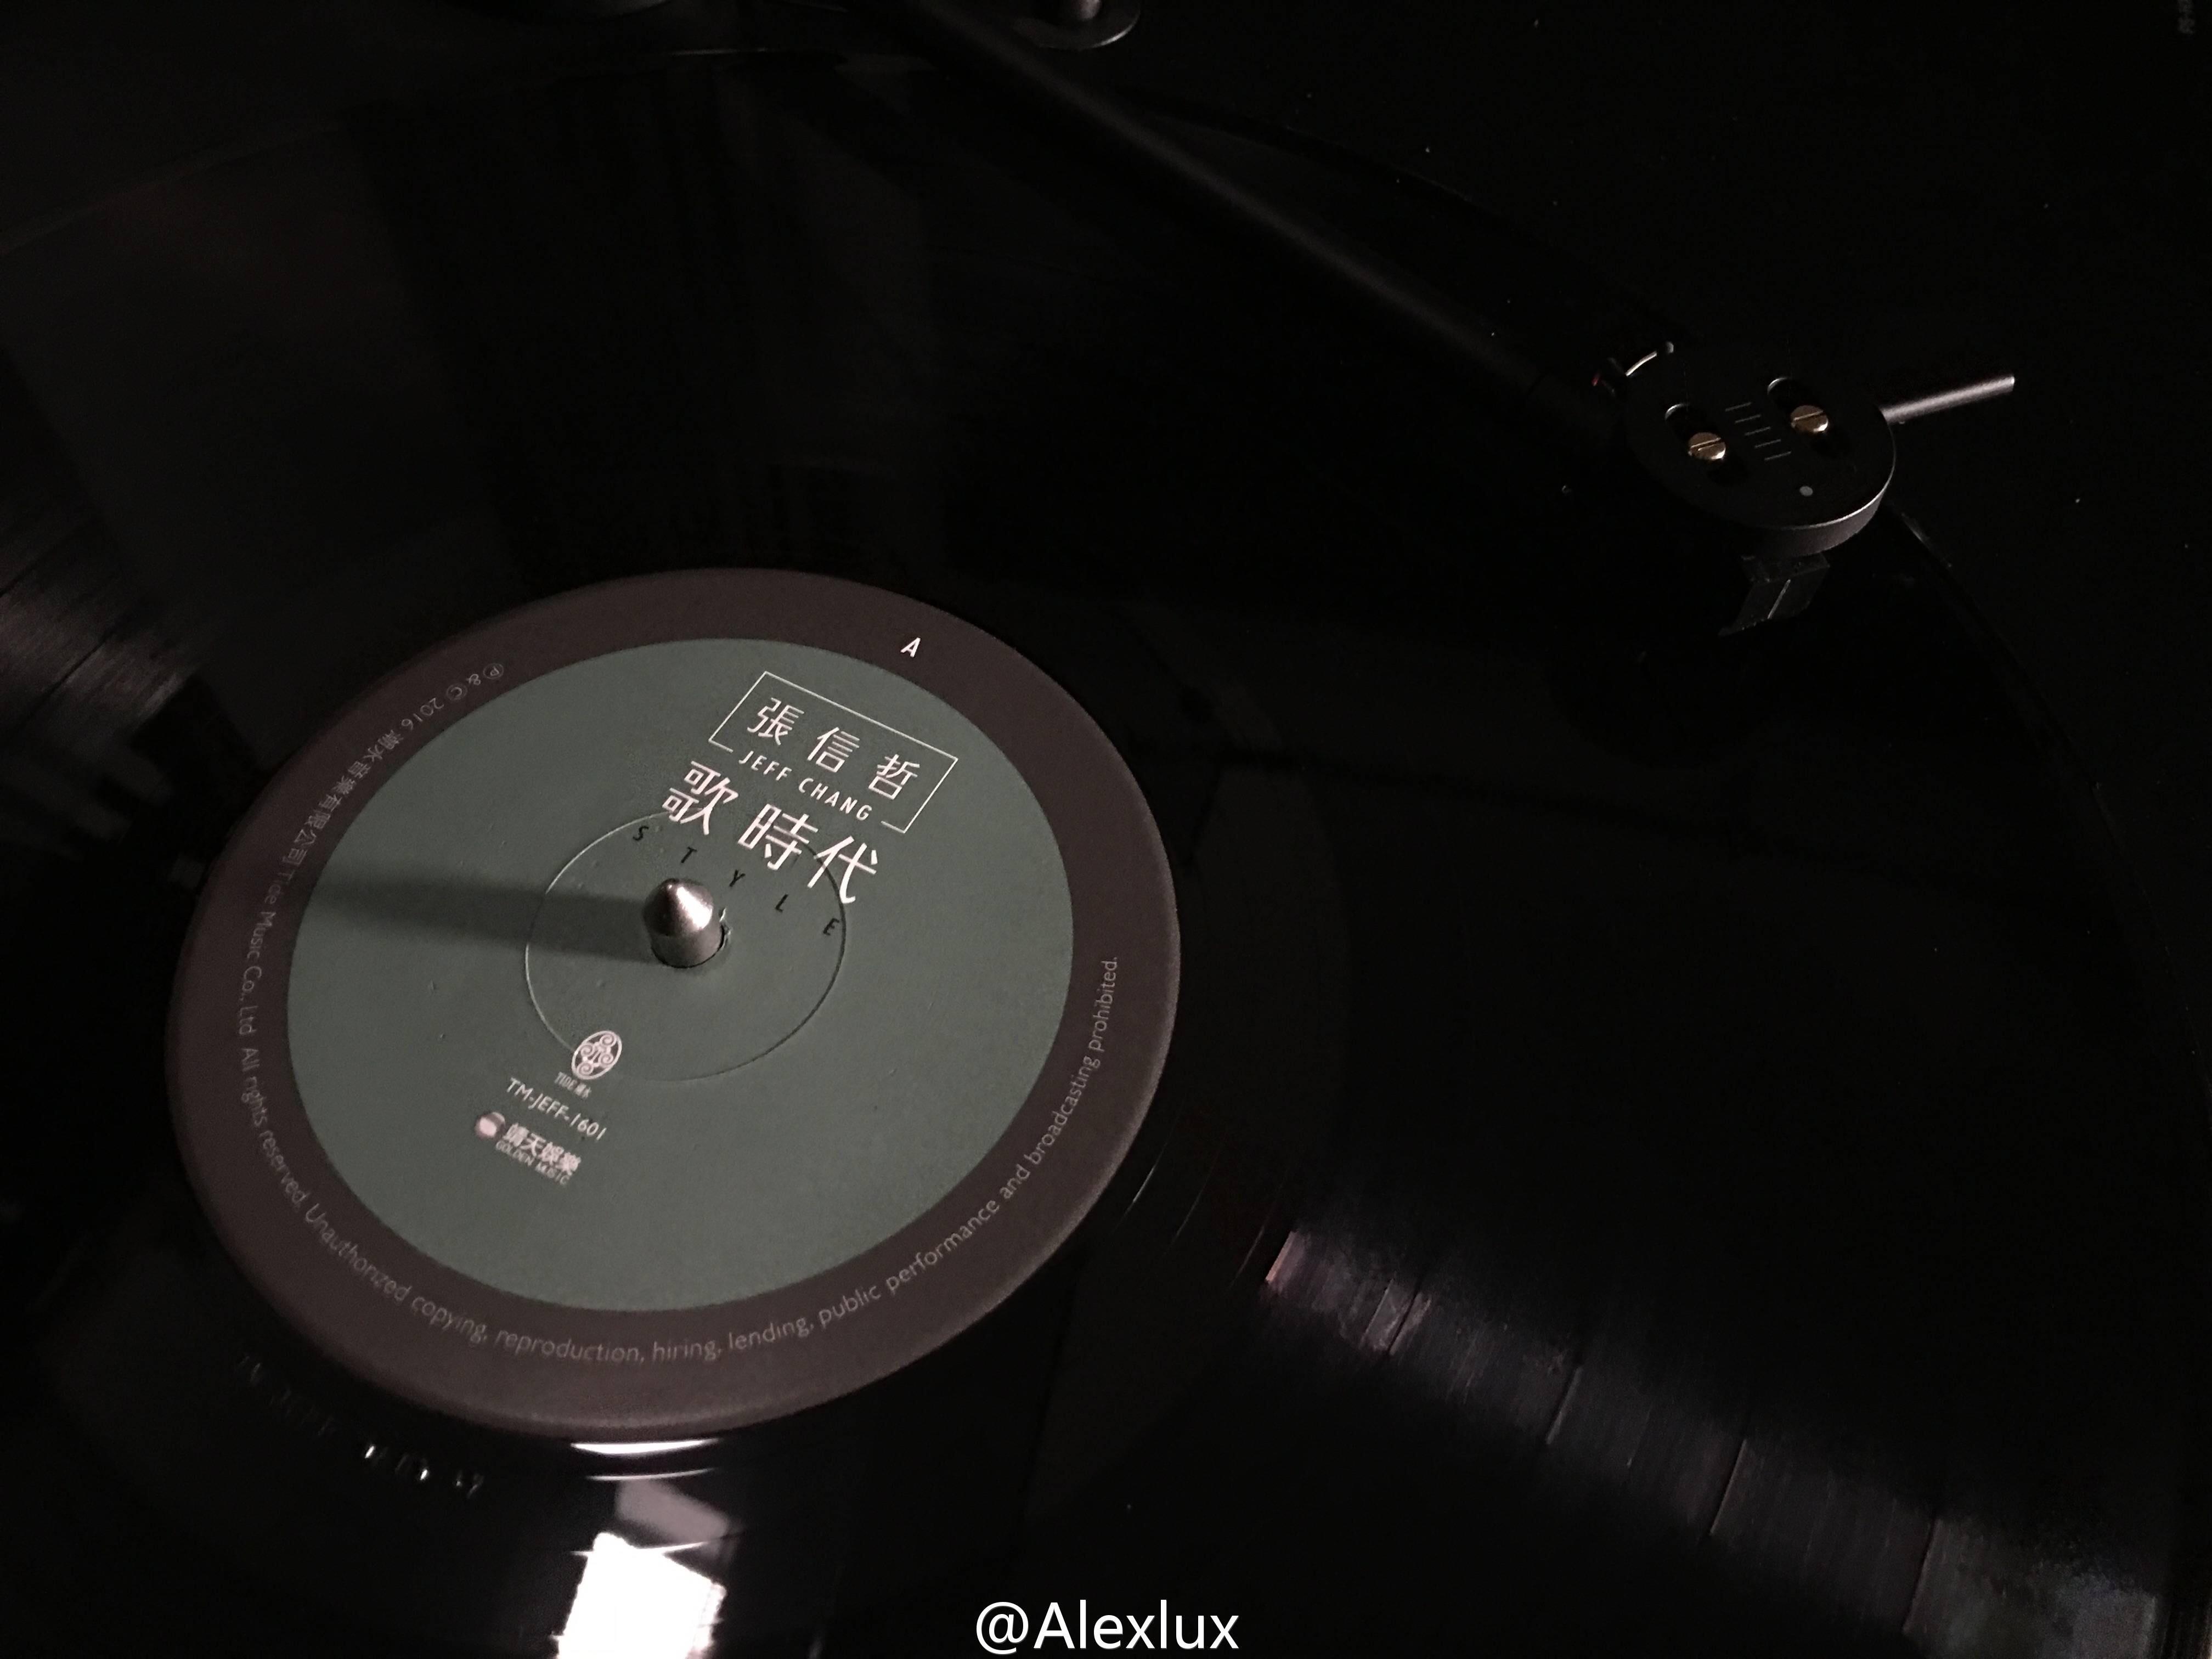 Sony Hi-Res PS-HX500黑胶唱盘!可把LP歌曲录制成DSD 5.6MHz音乐档案!